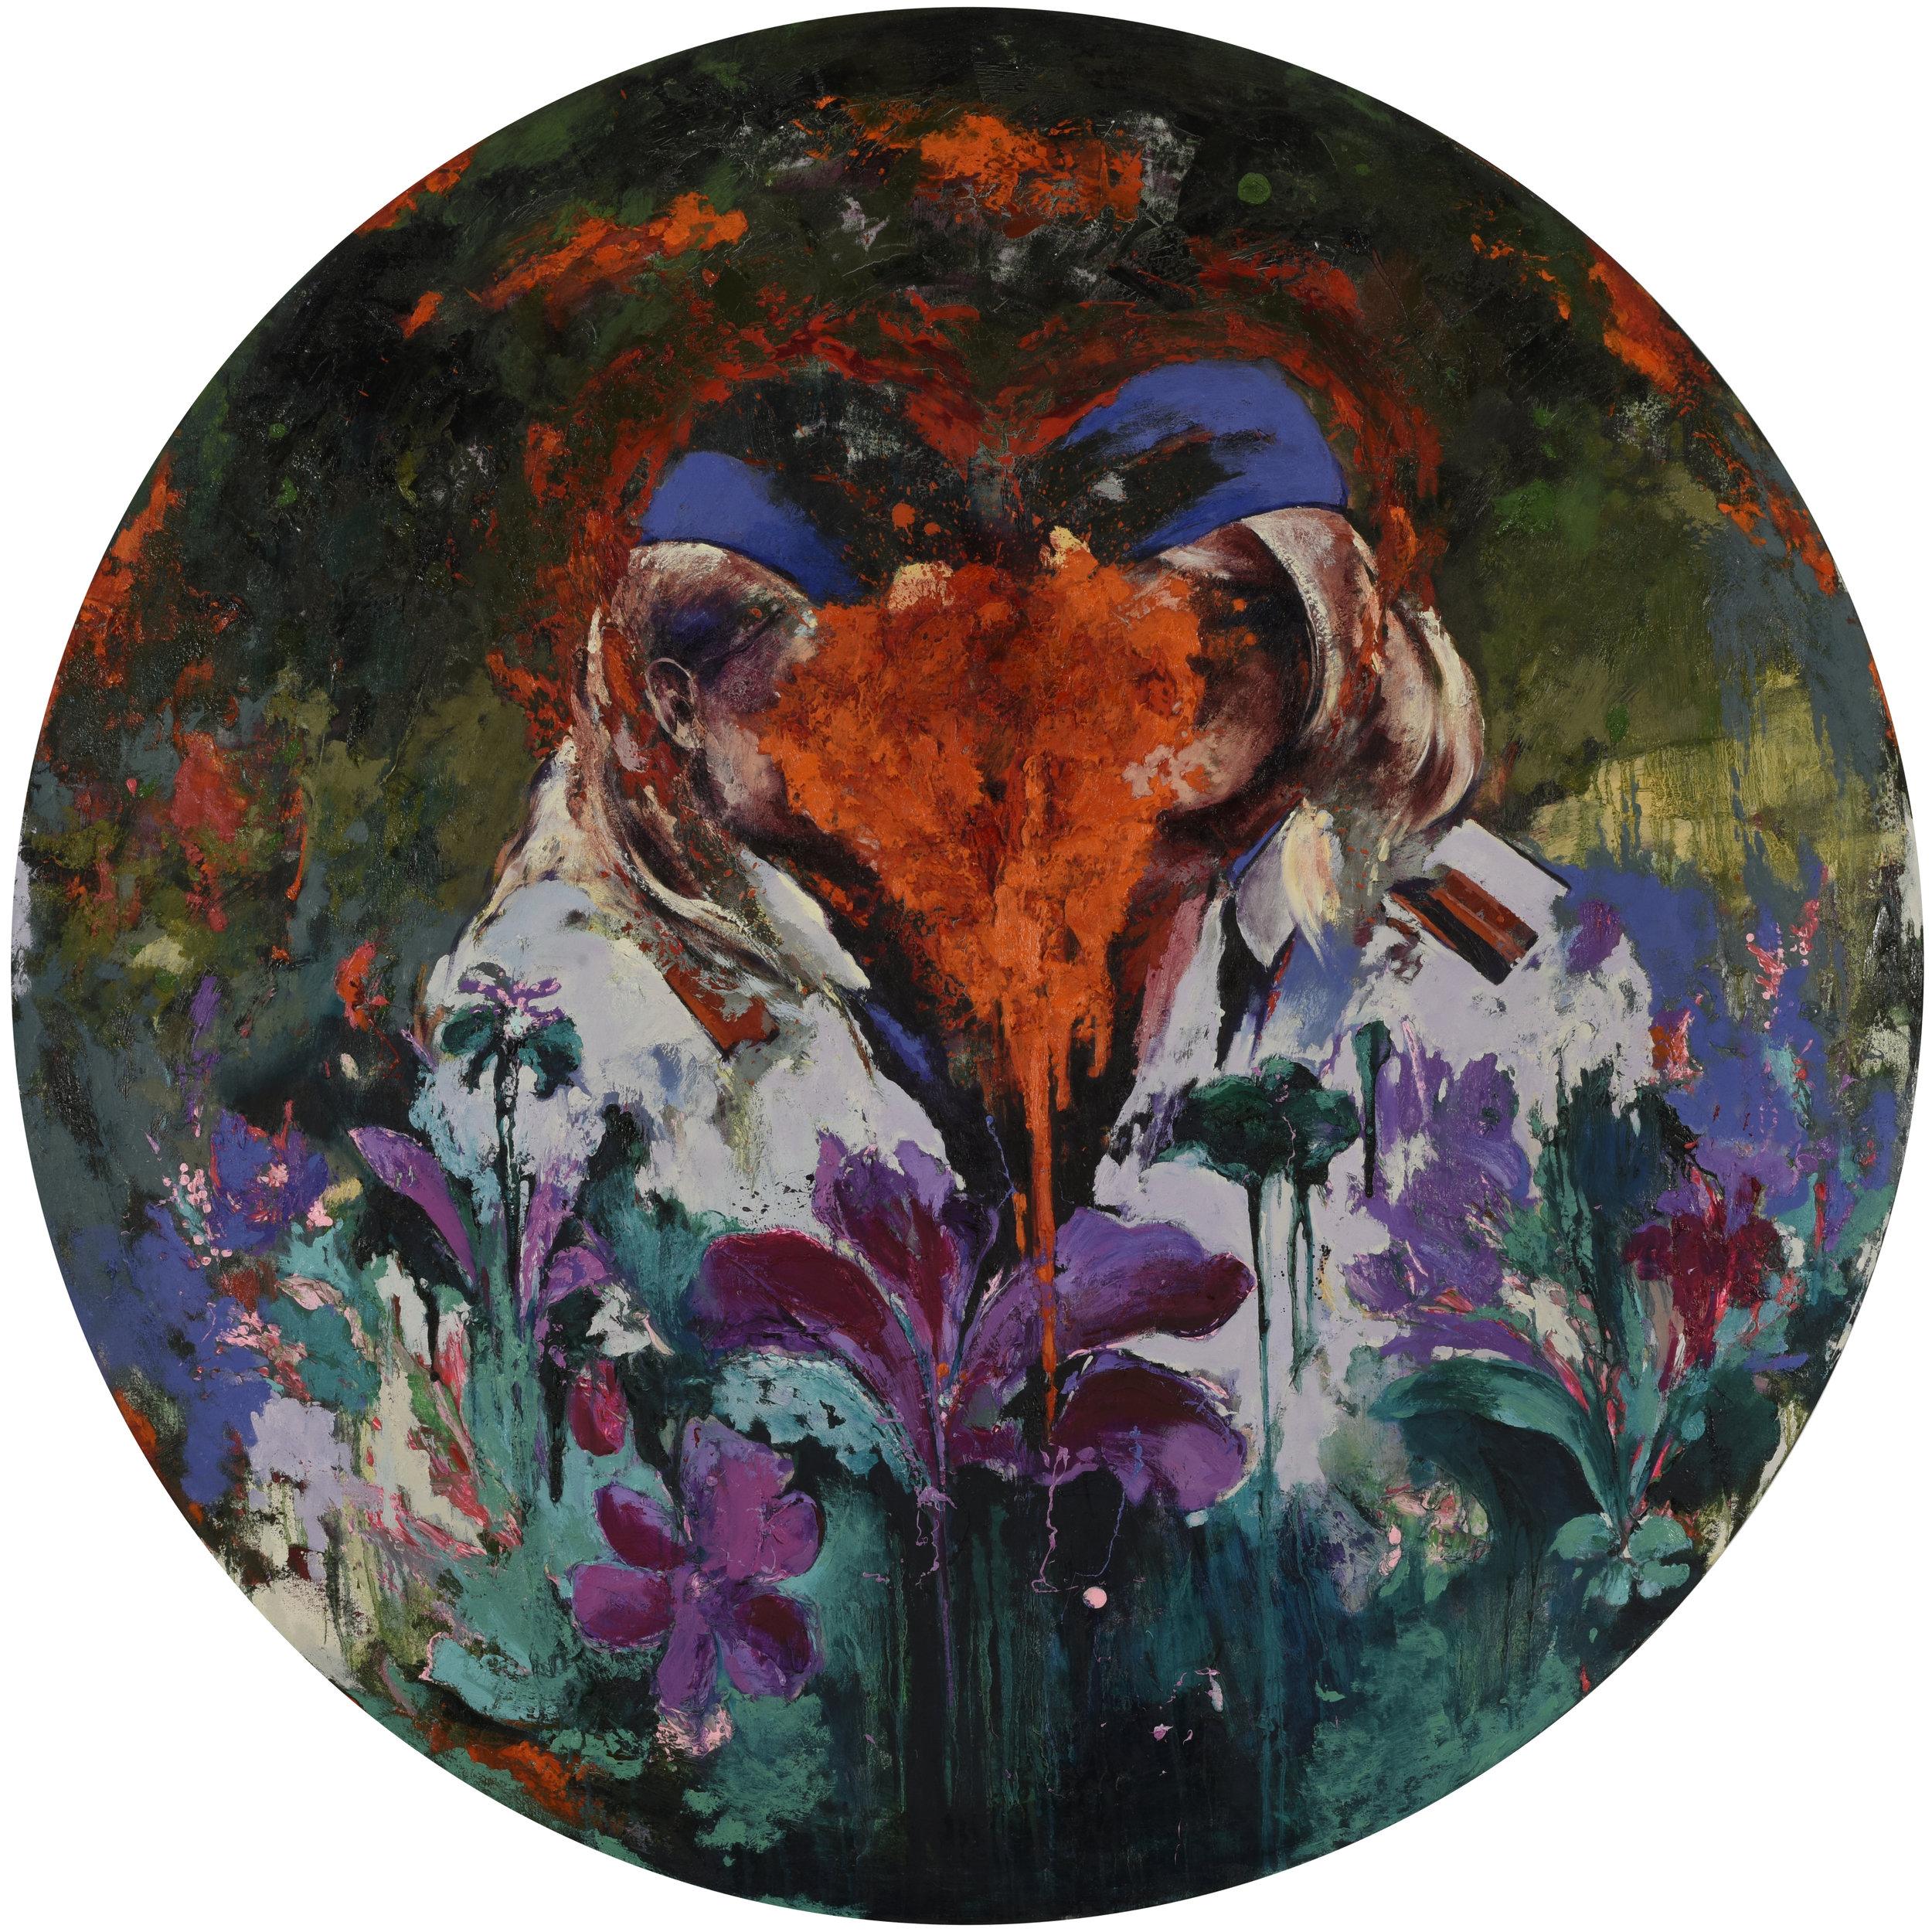 Flower Box 3 - Oil on canvasD: 156 cm